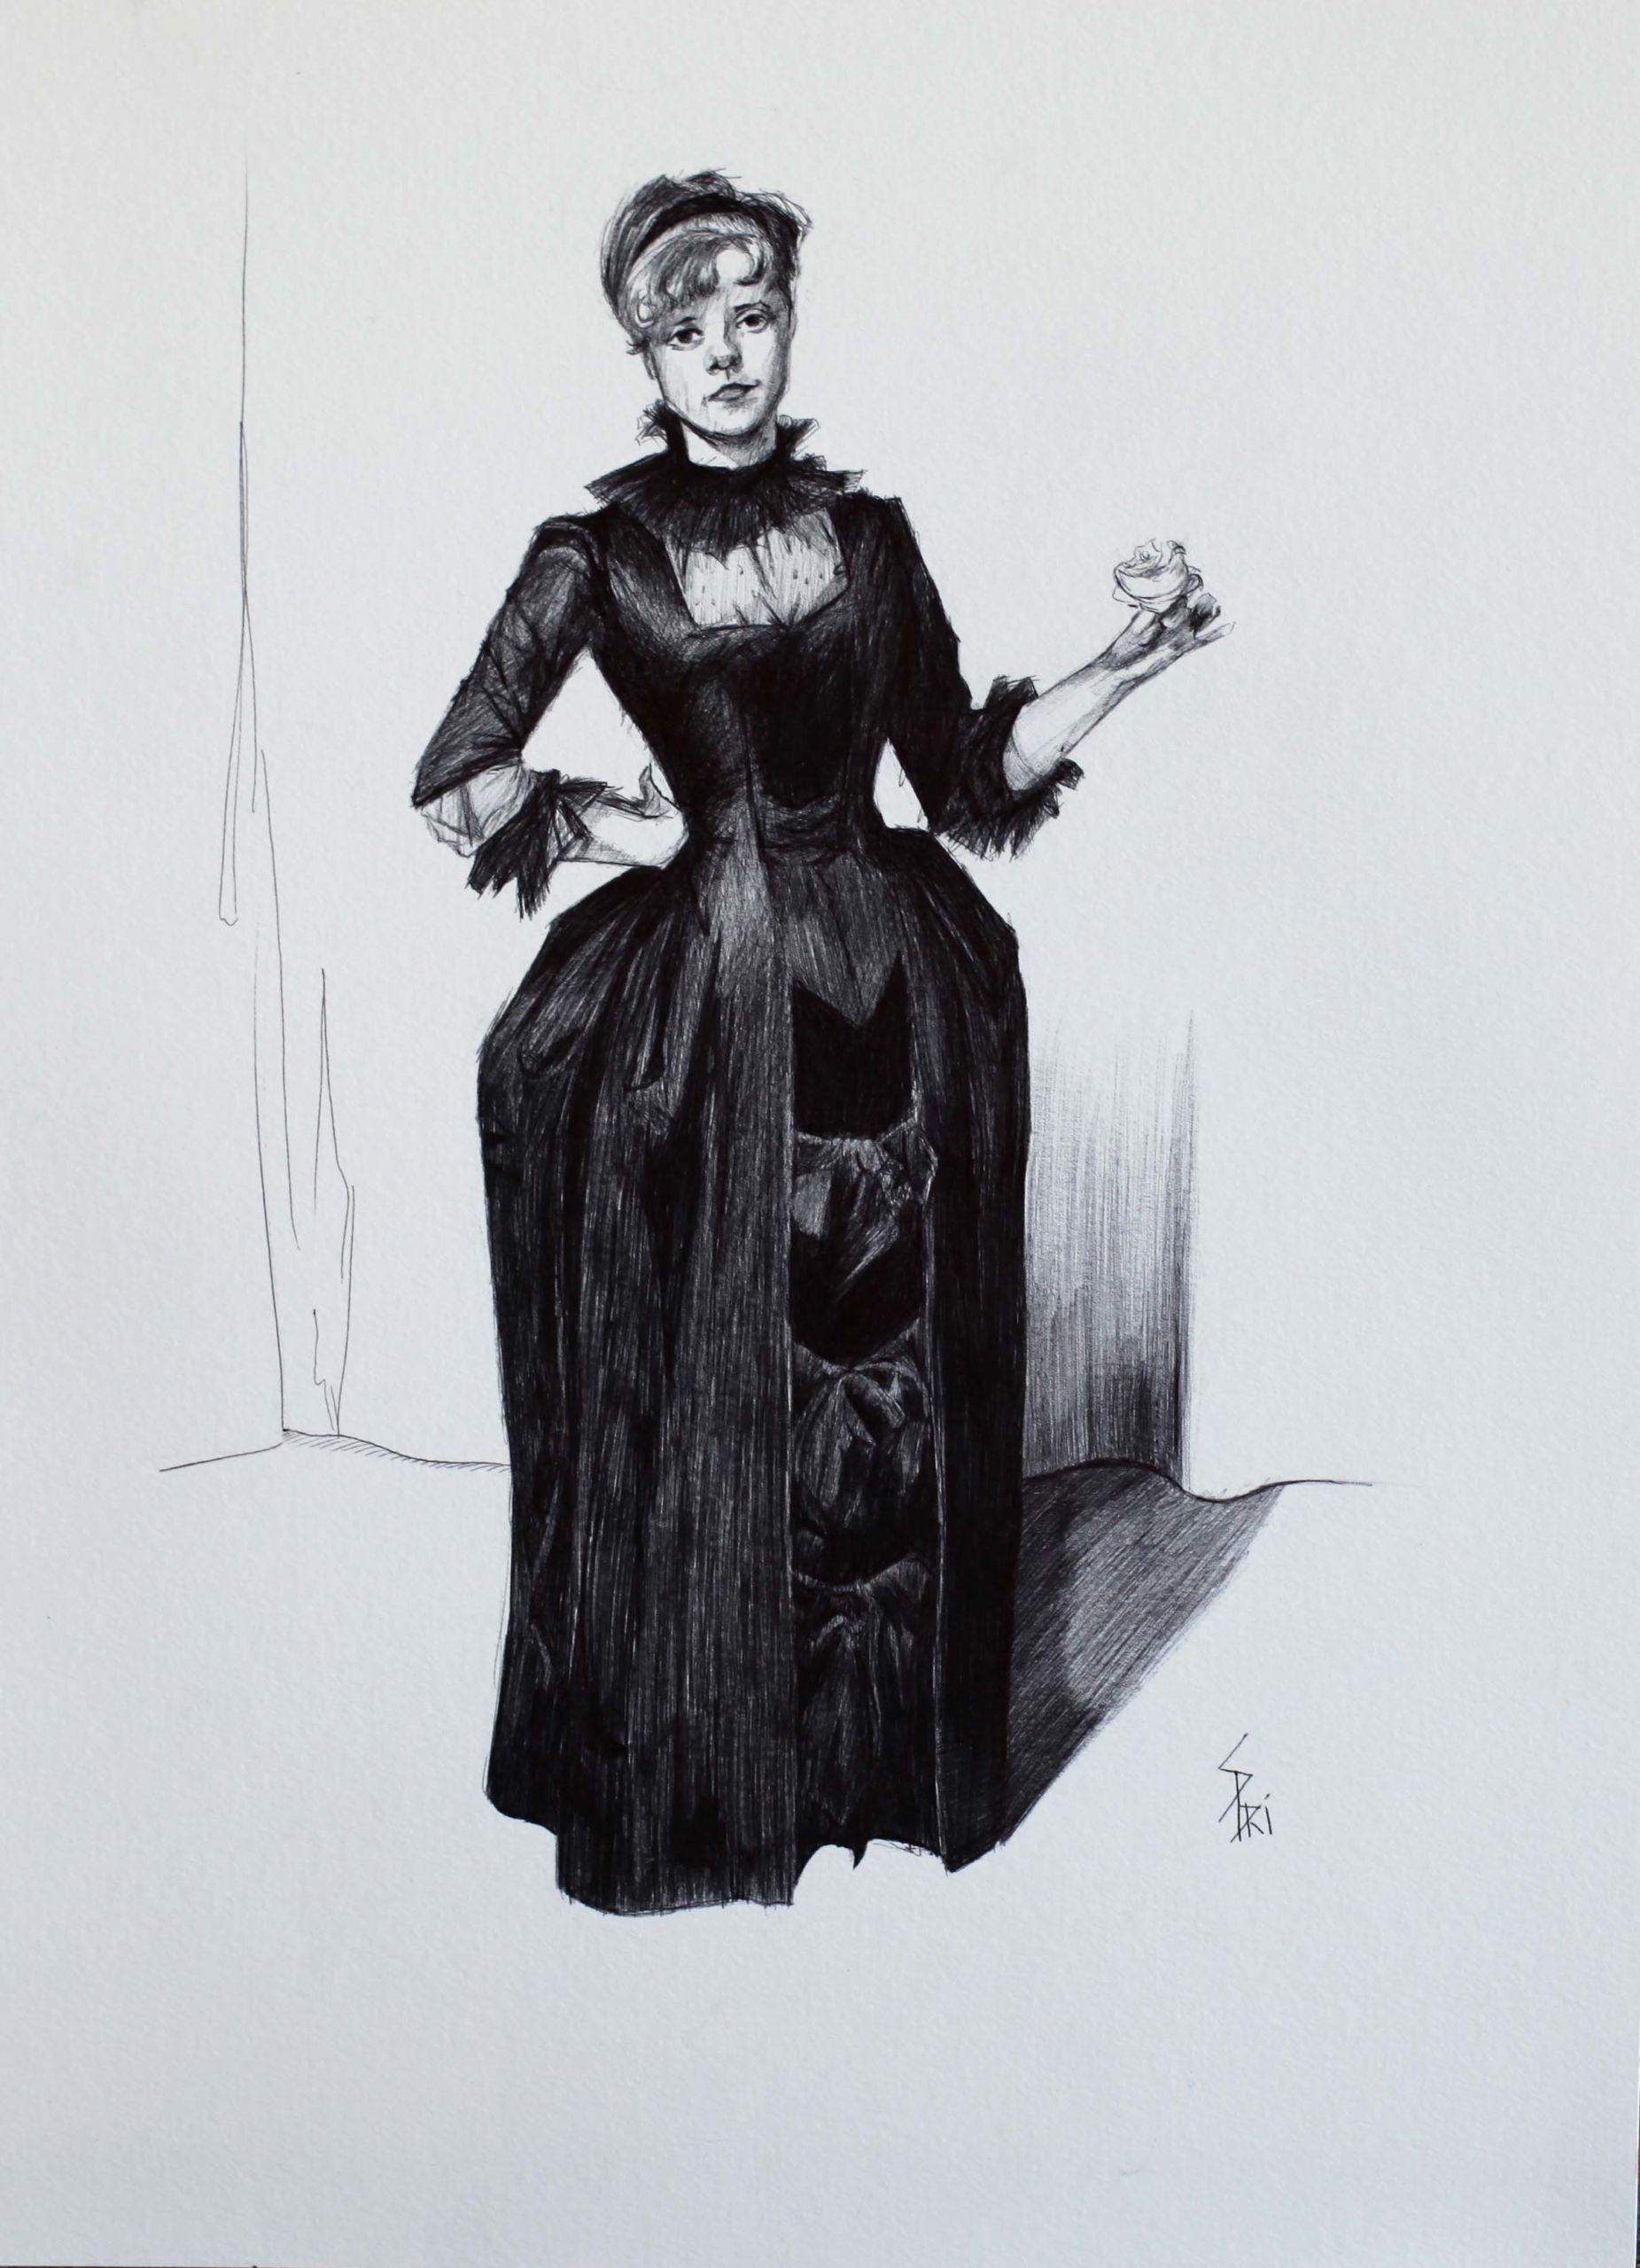 dessin au stylo bic par Priscilla Seiller